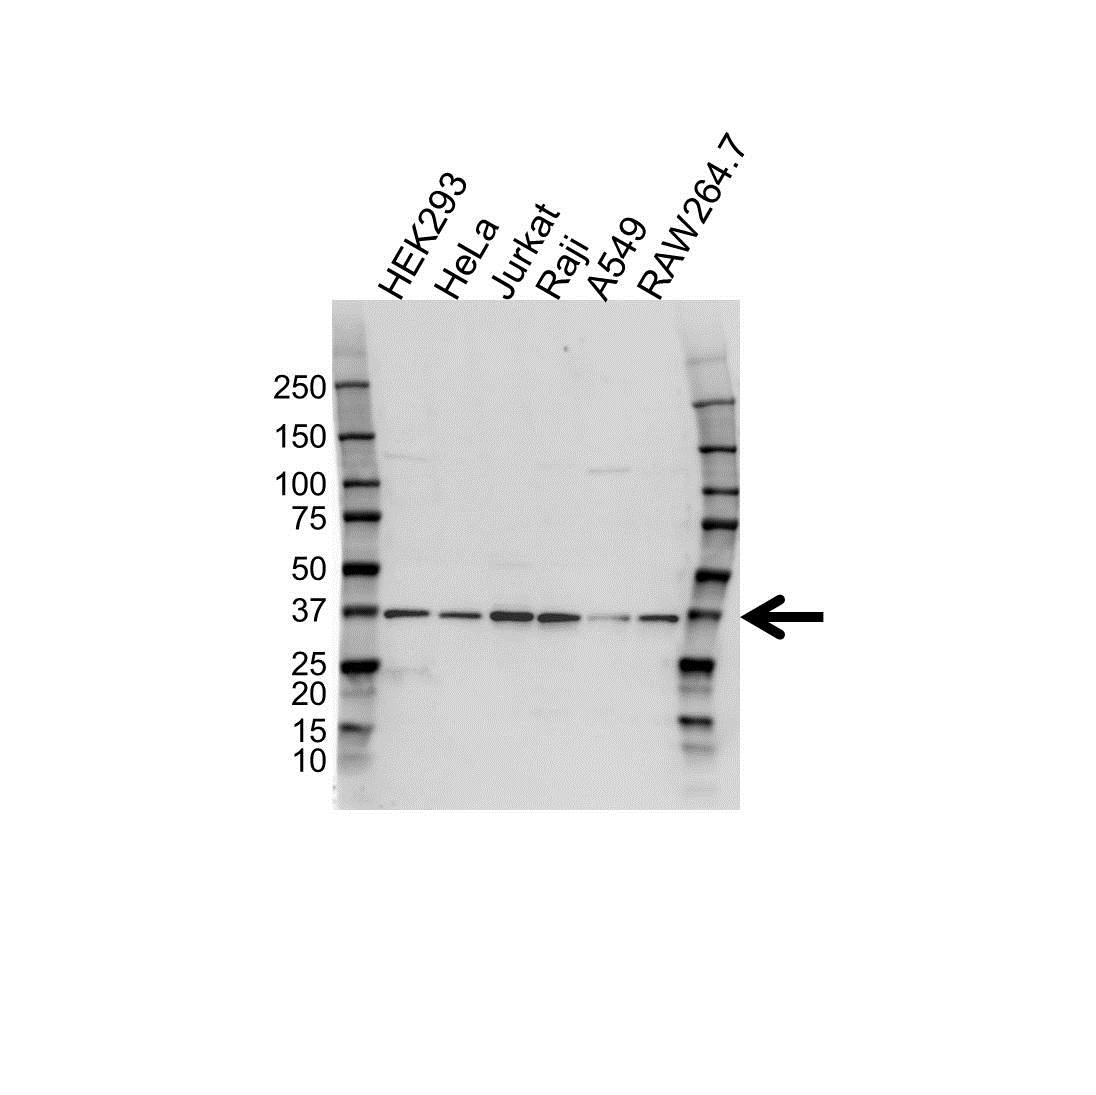 U2AF1 Antibody (PrecisionAb<sup>TM</sup> Antibody) gallery image 1